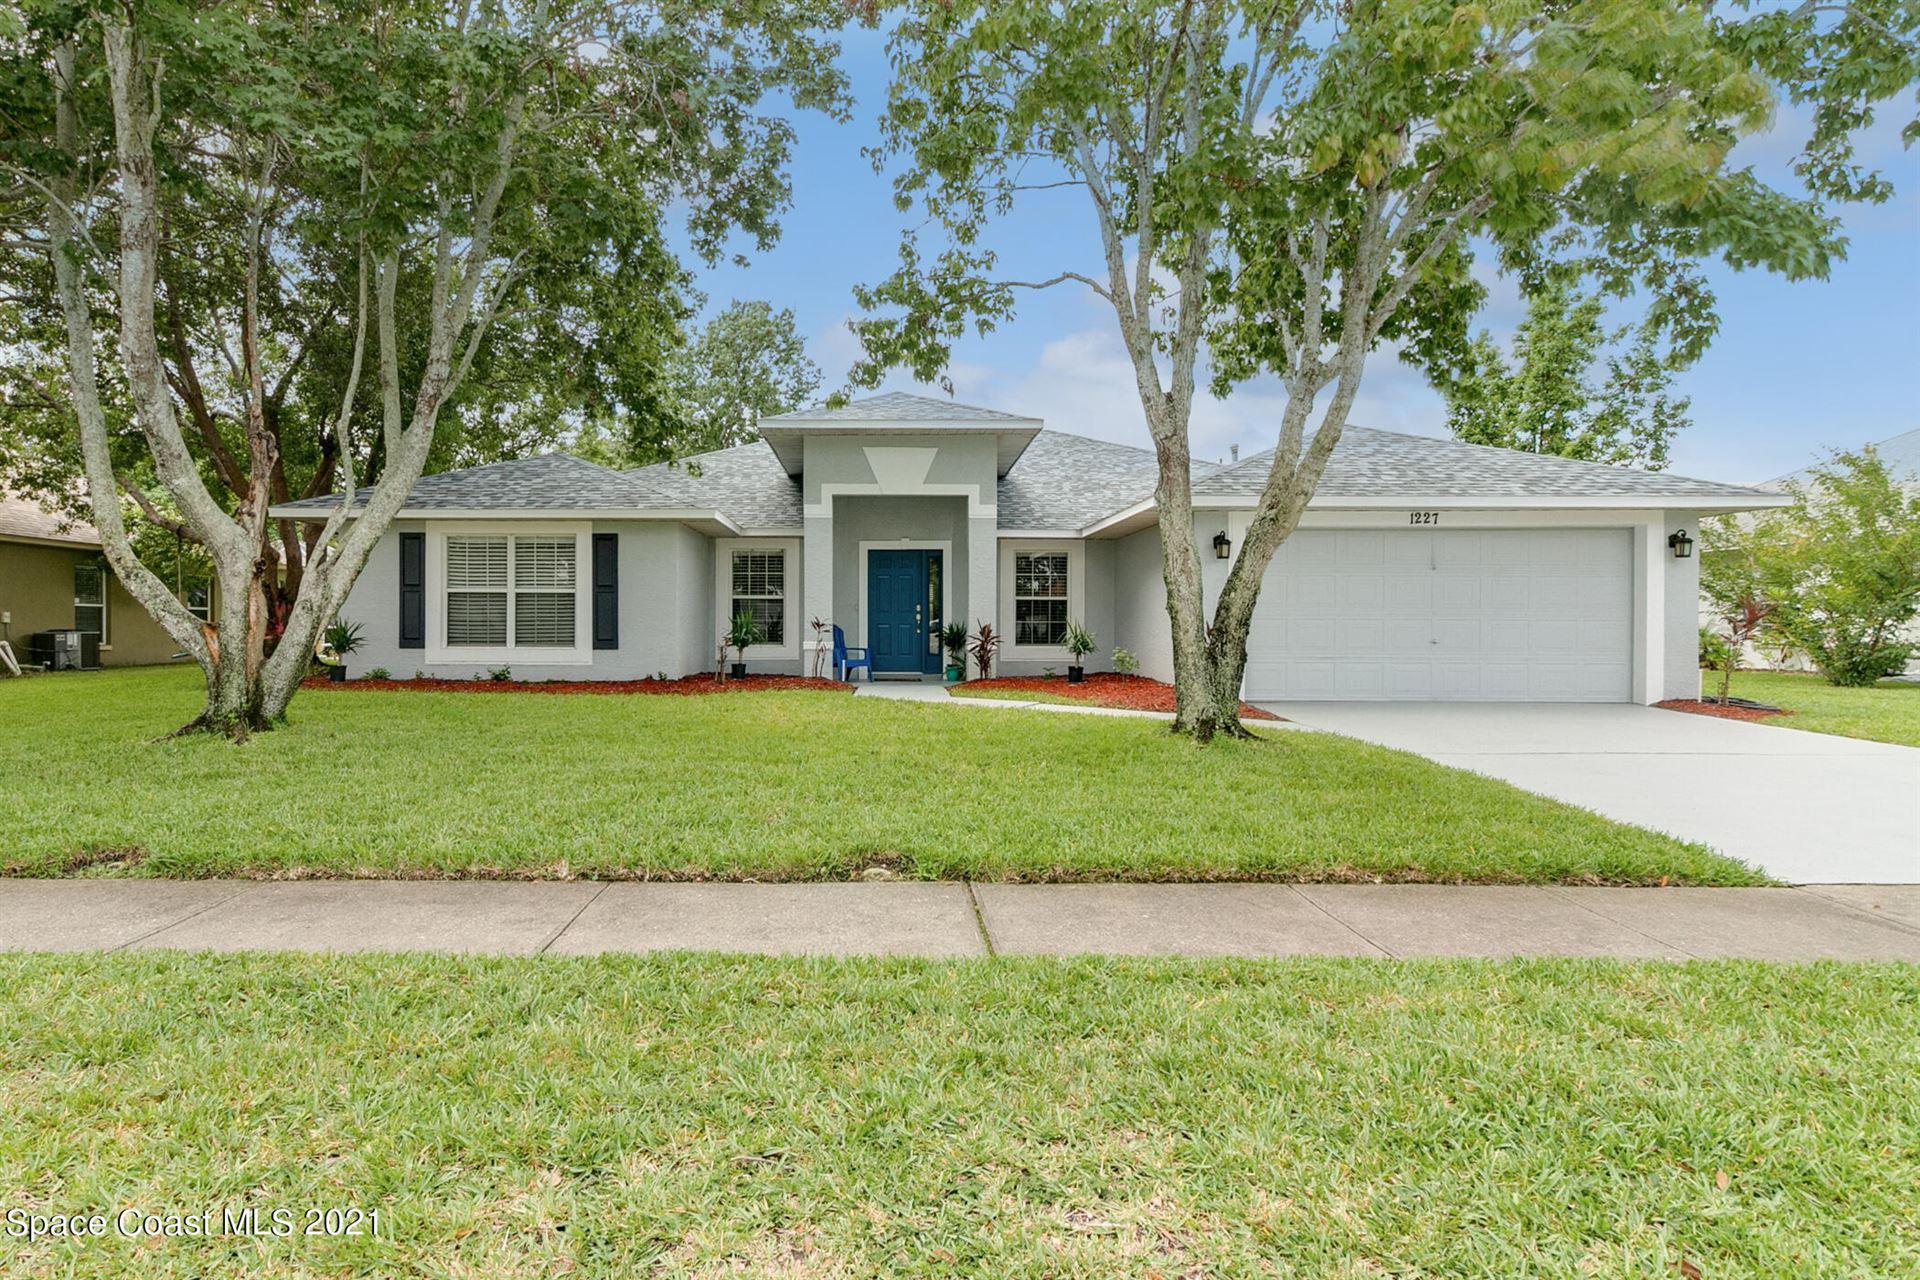 1227 Winding Meadows Road, Rockledge, FL 32955 - #: 916121